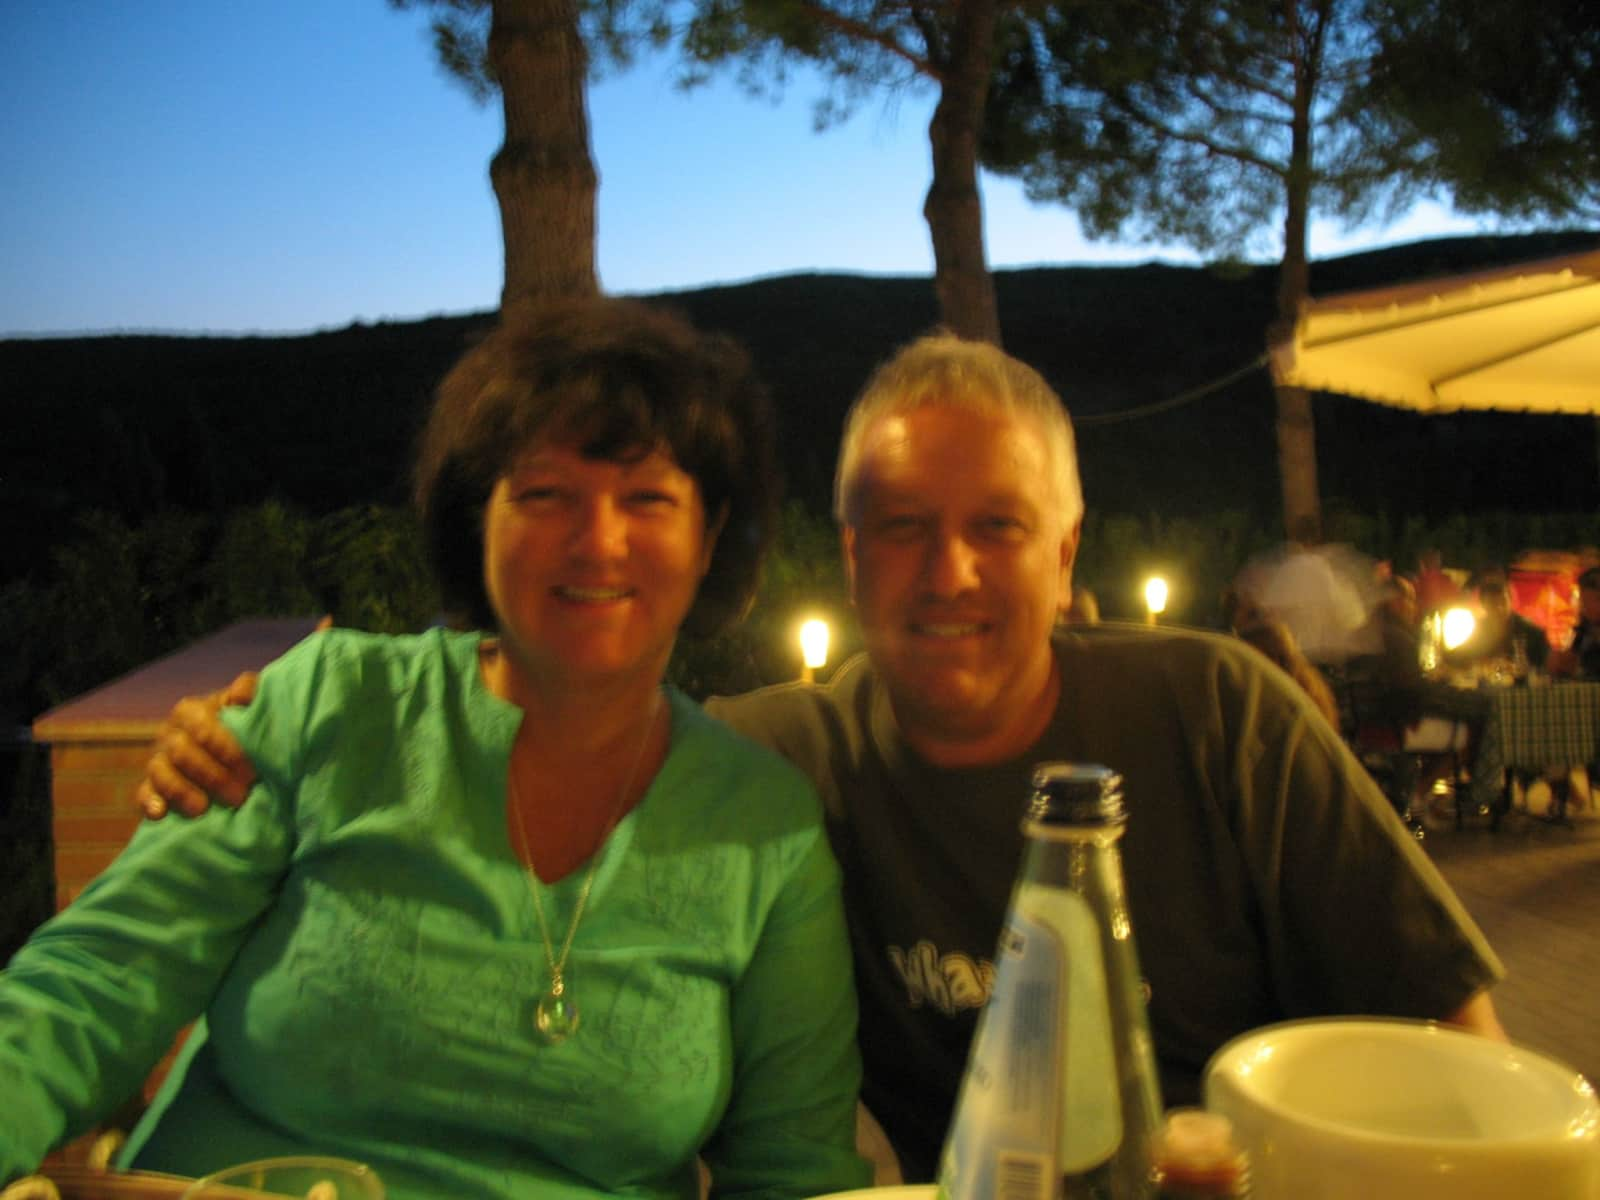 Moira & Chris from Bury St Edmunds, United Kingdom